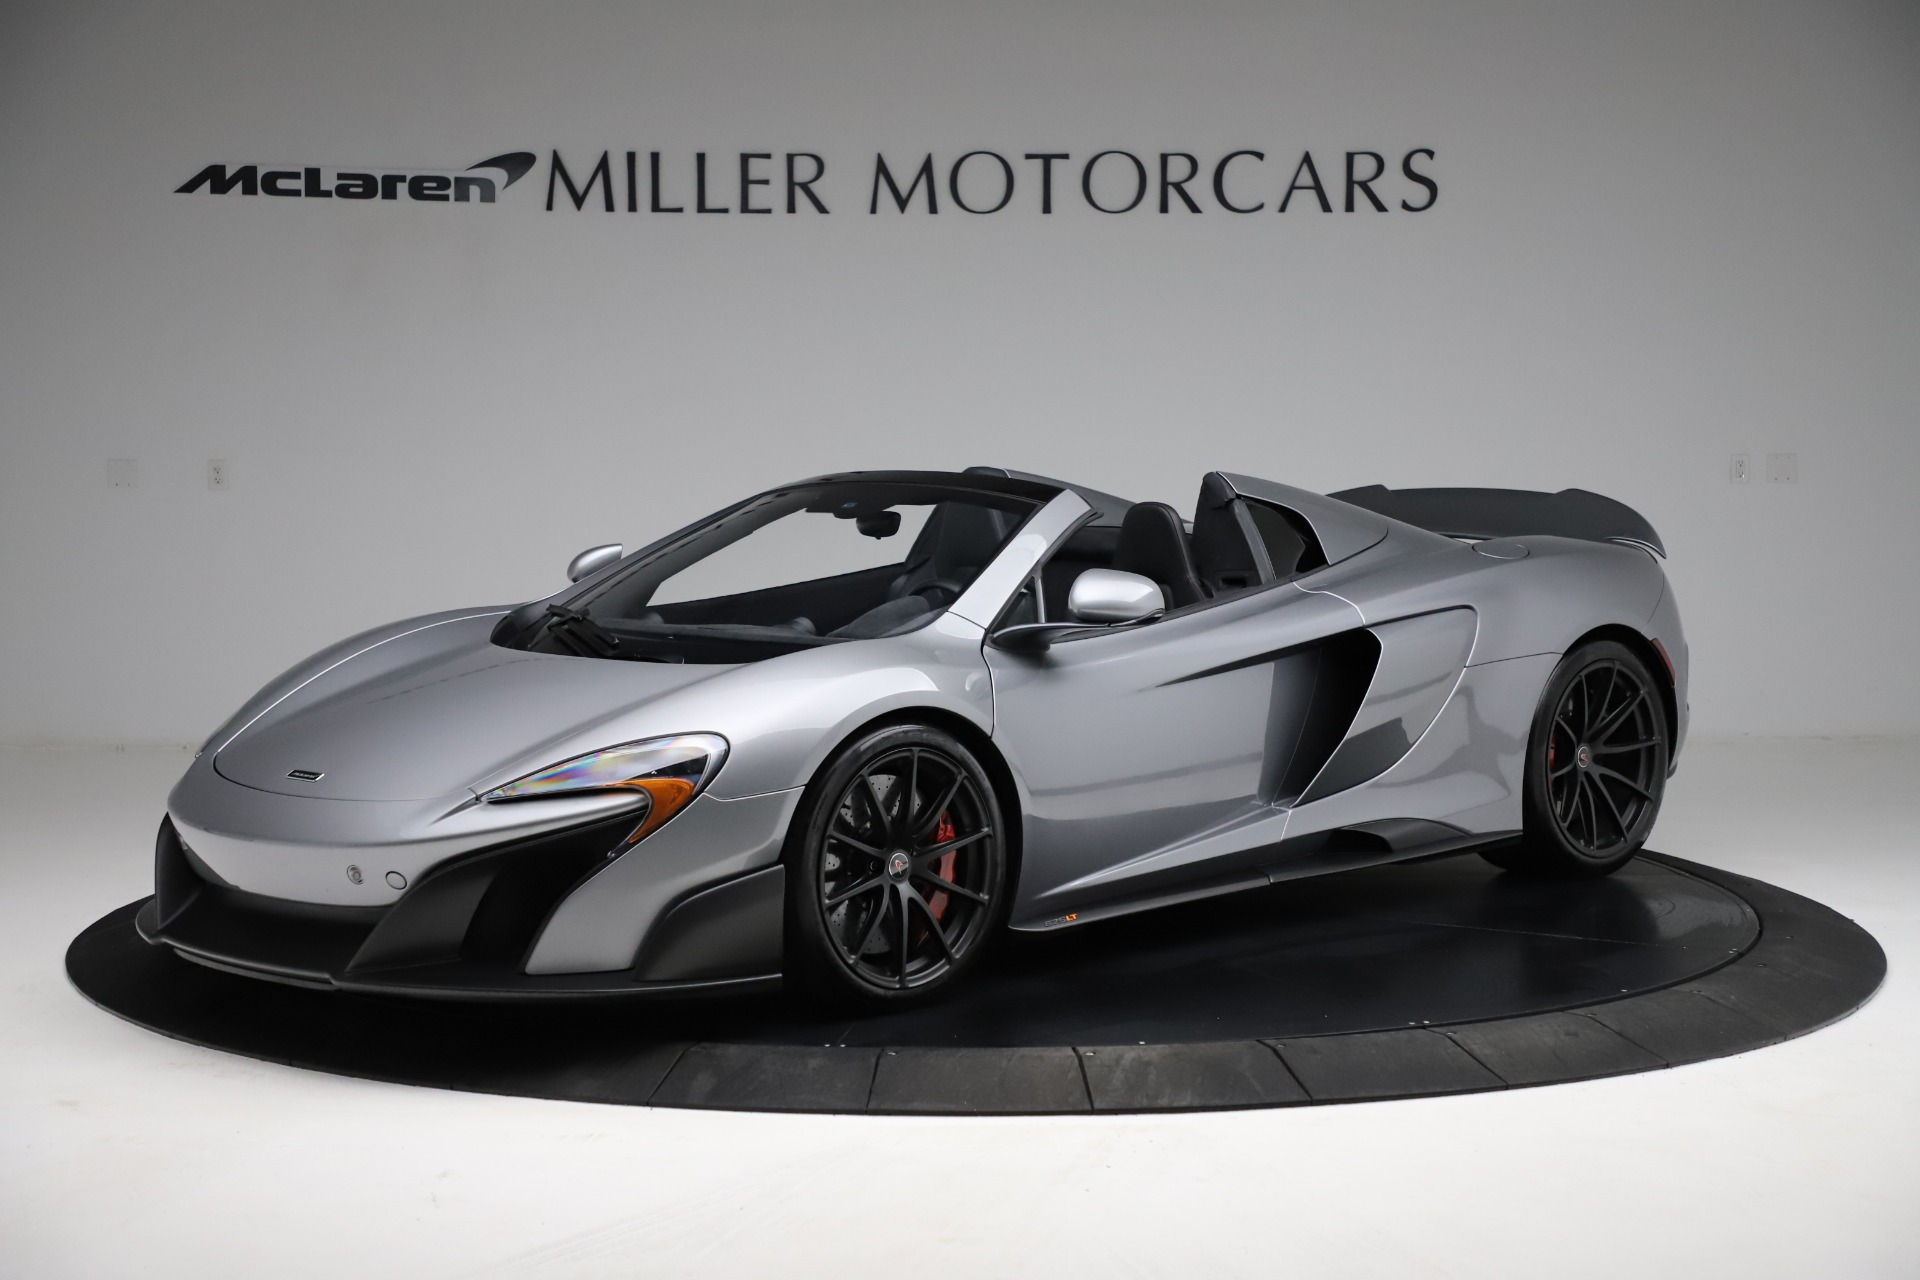 Used 2016 McLaren 675LT Spider for sale $275,900 at McLaren Greenwich in Greenwich CT 06830 1